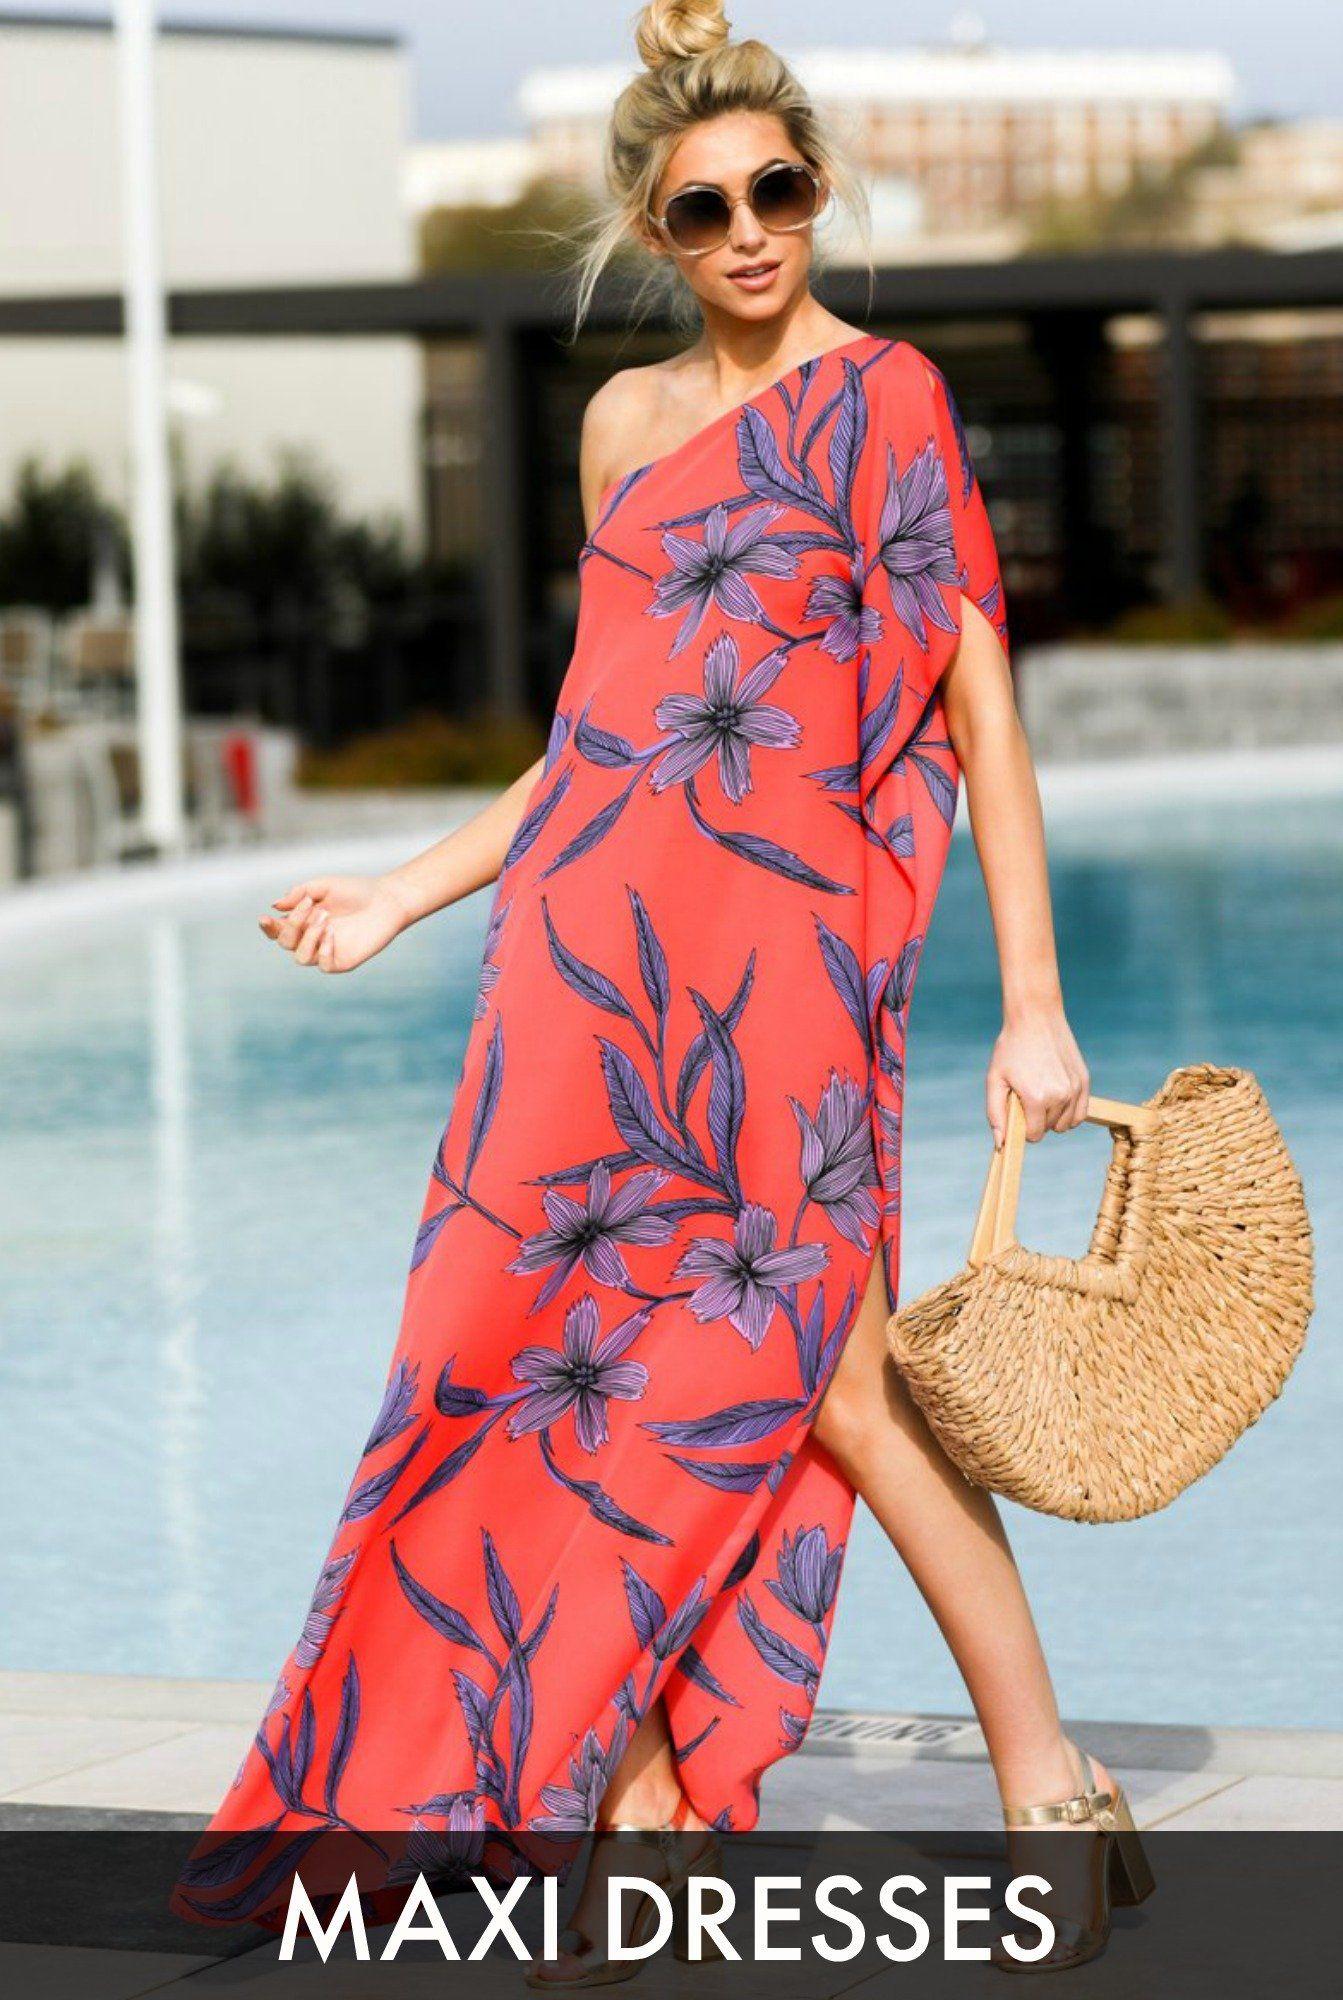 9d25f3d676fc Lovely Yellow Floral Maxi Dress - Floral Print Wrap Dress - Maxi - $48 –  Red Dress